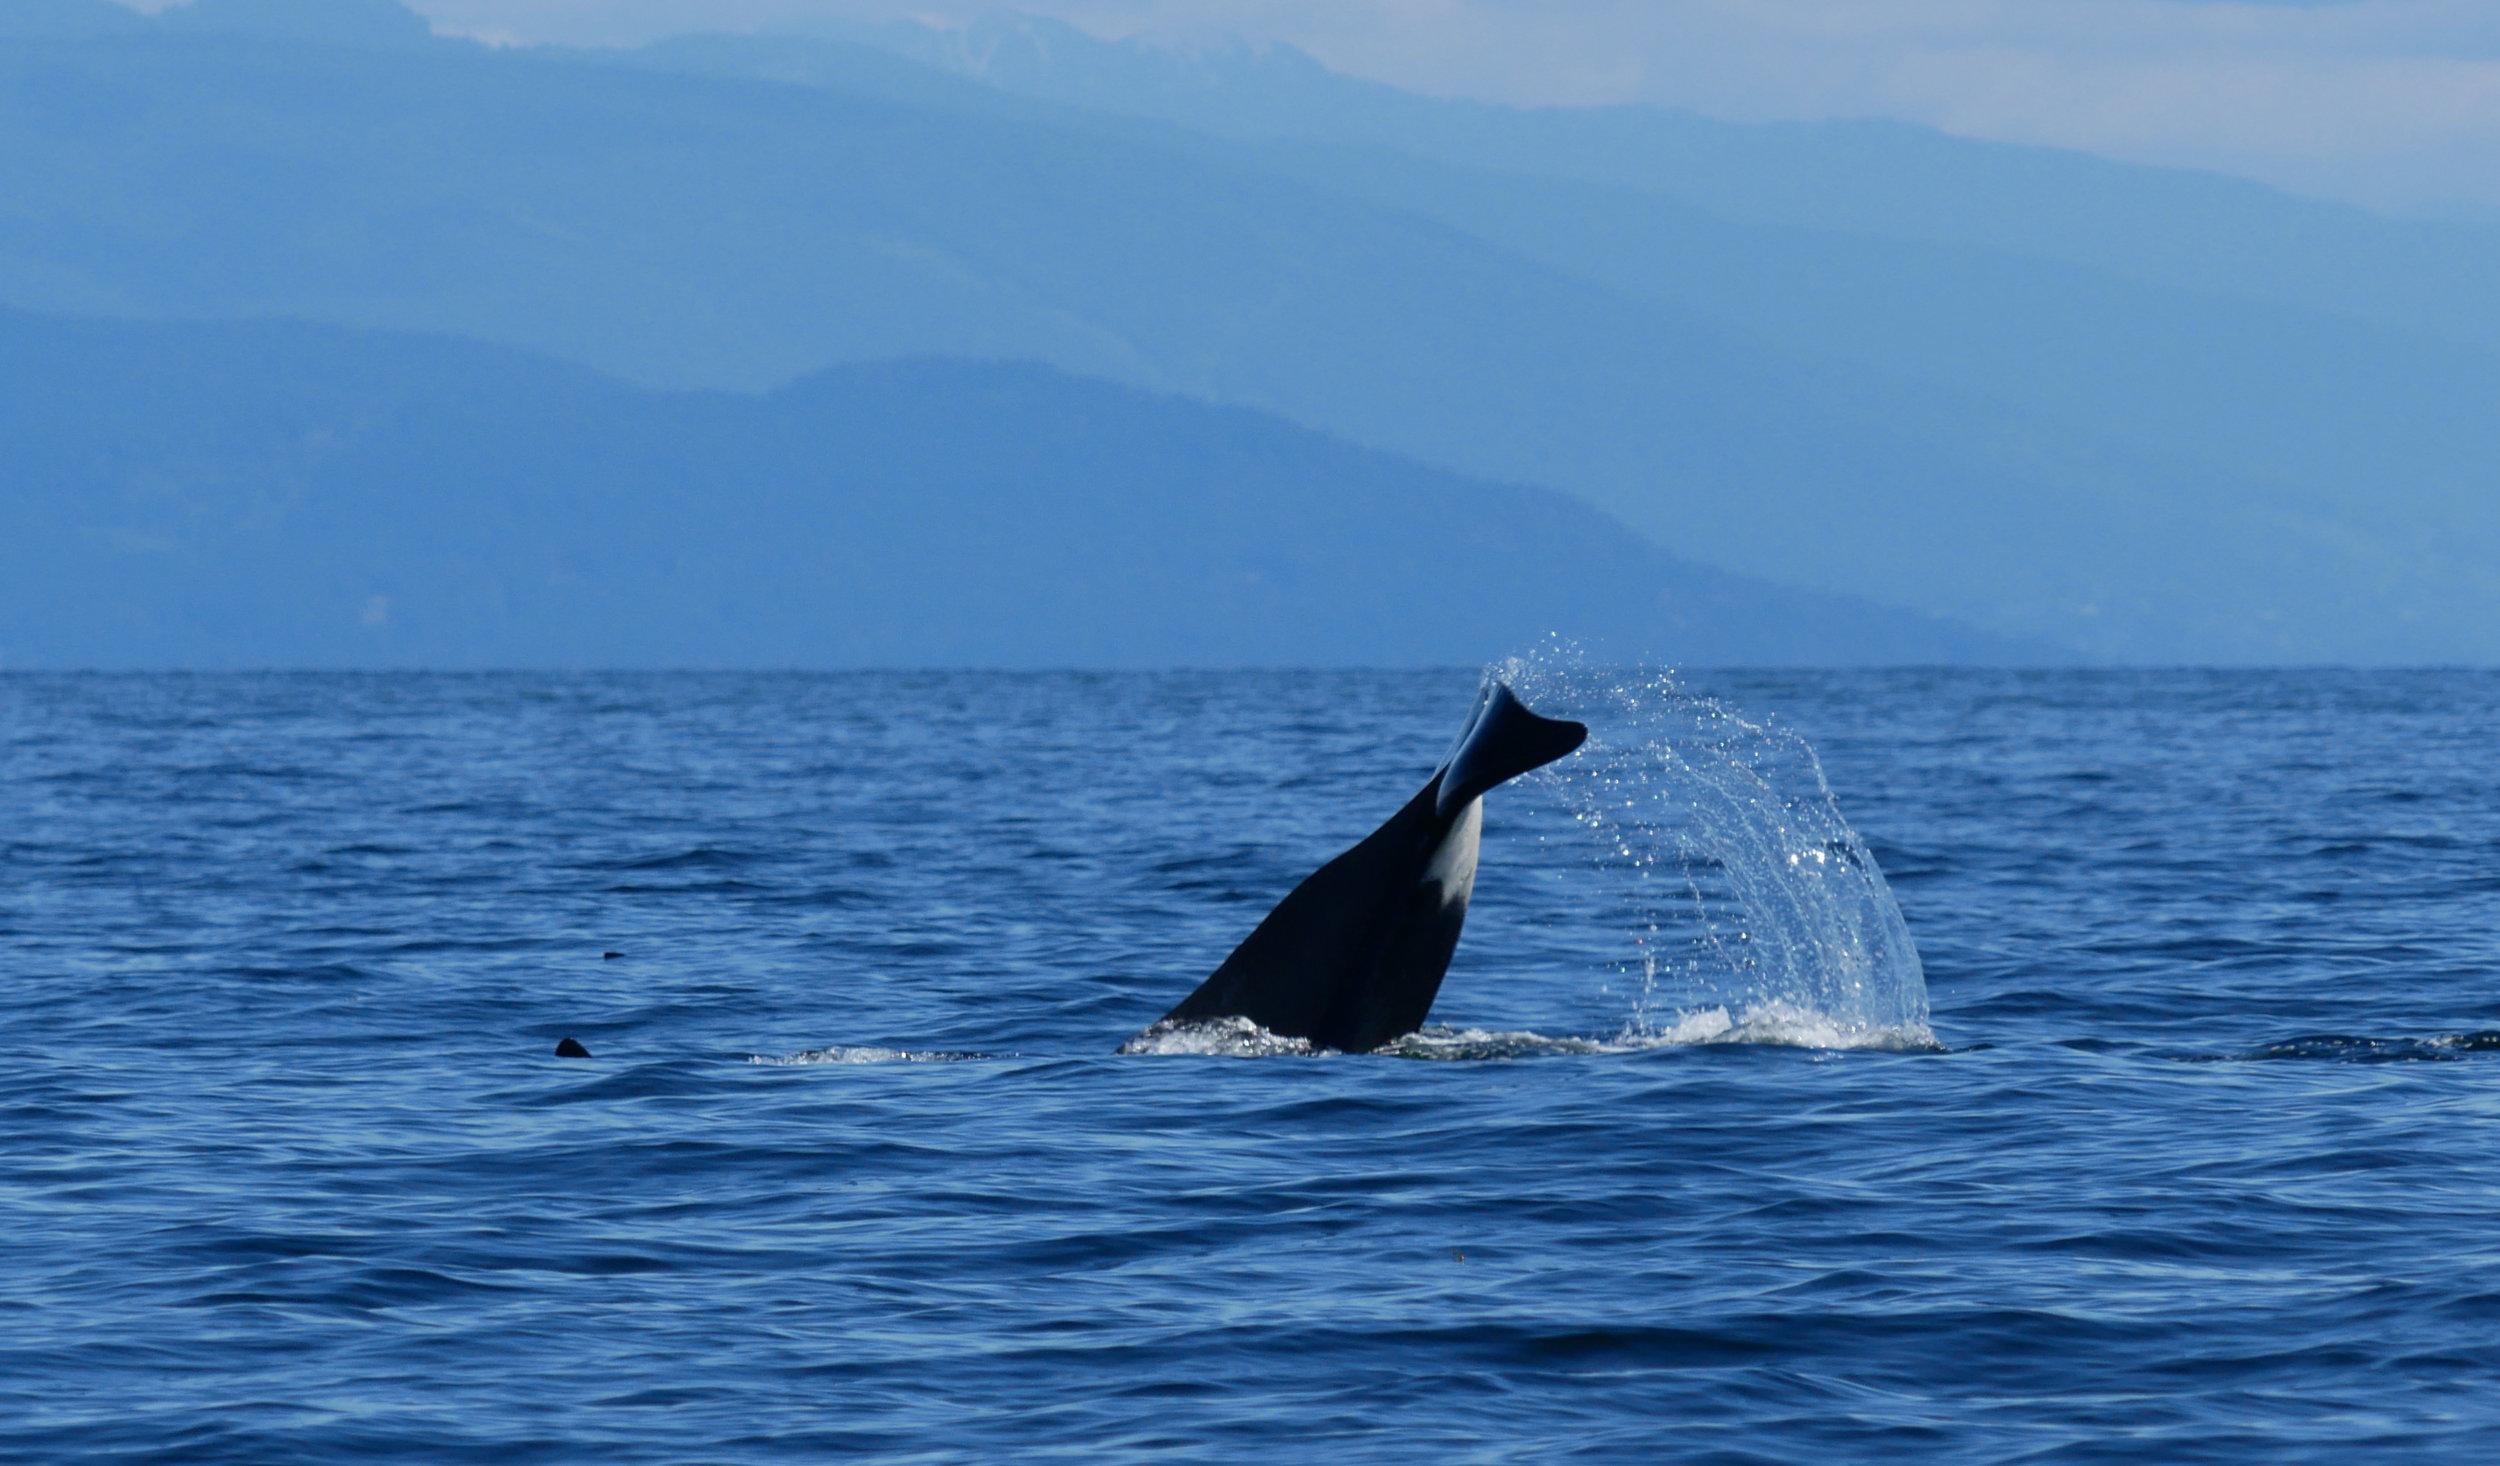 Big tail lob! Photo by Cheyenne Brewster.